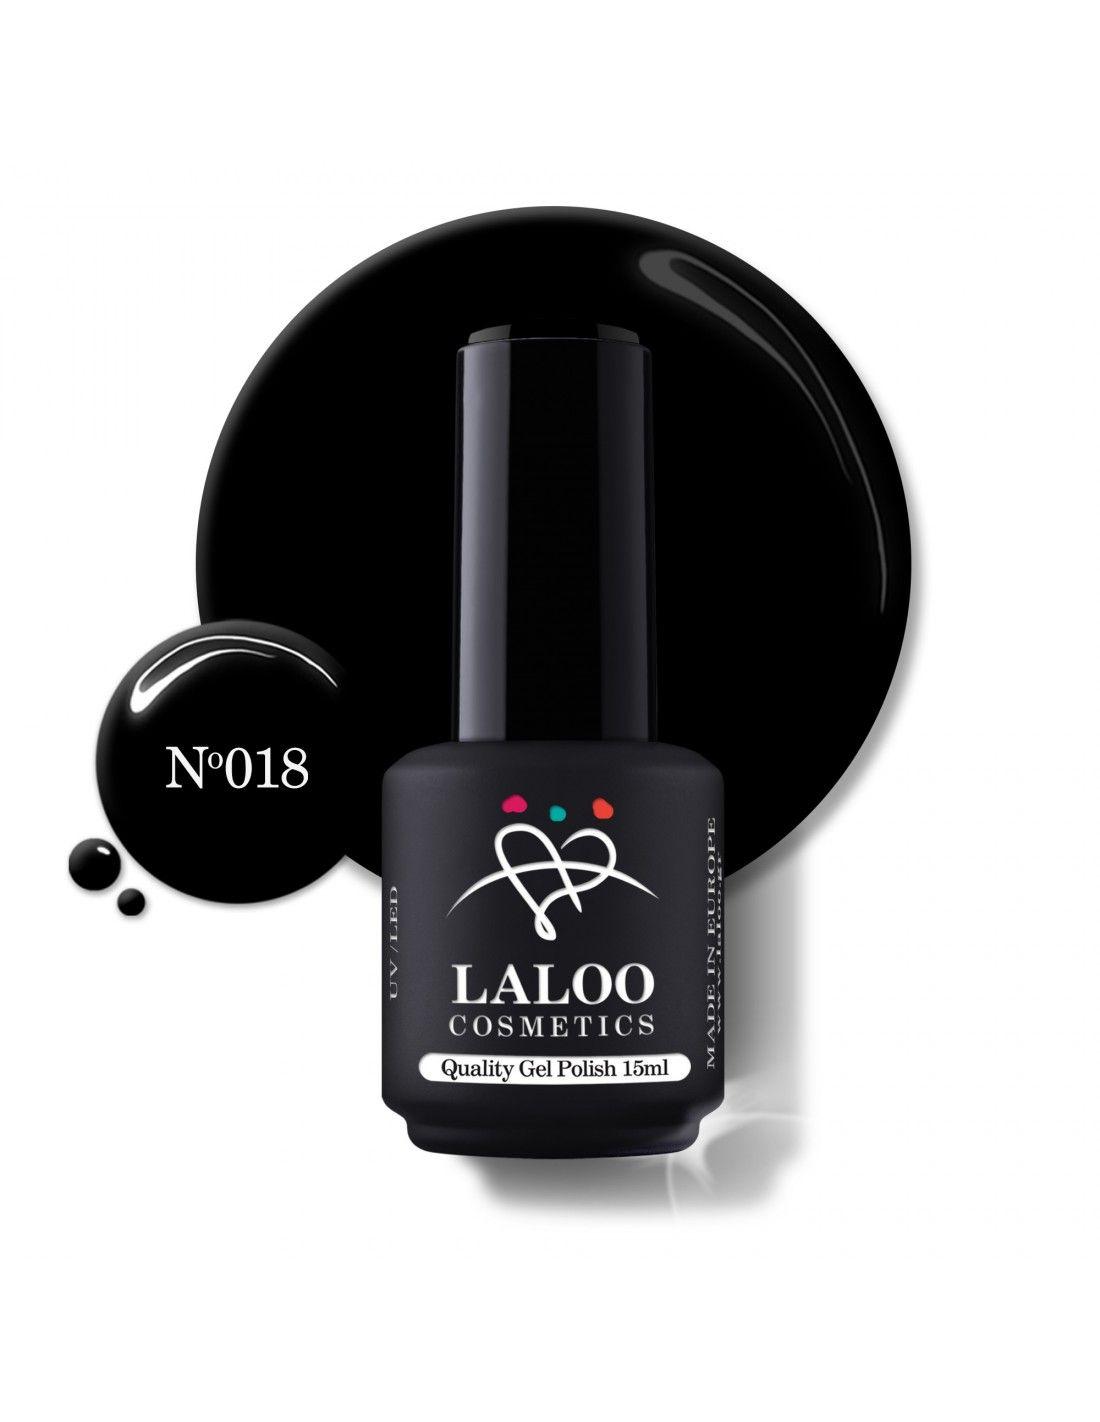 Laloo Βερνίκι No.315 Nude Μπεζ · Pantazis Hair Shop